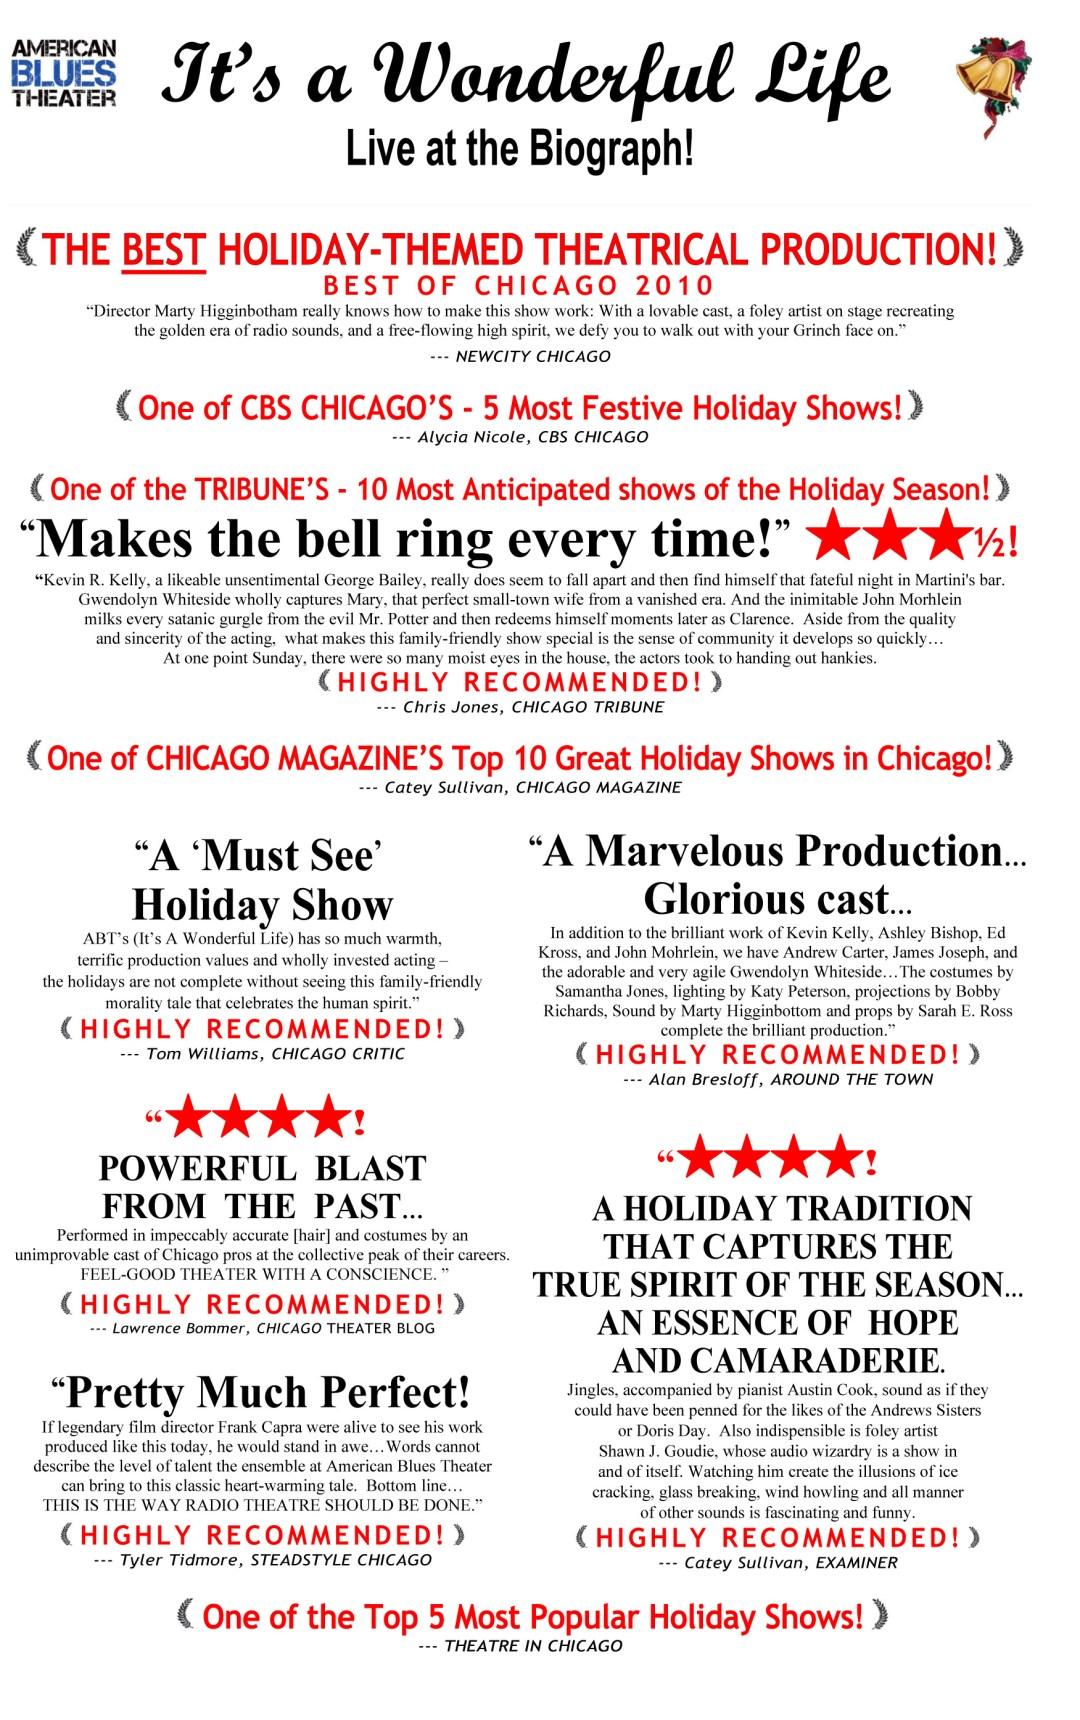 It's a Wonderful Life 2012 Reviews